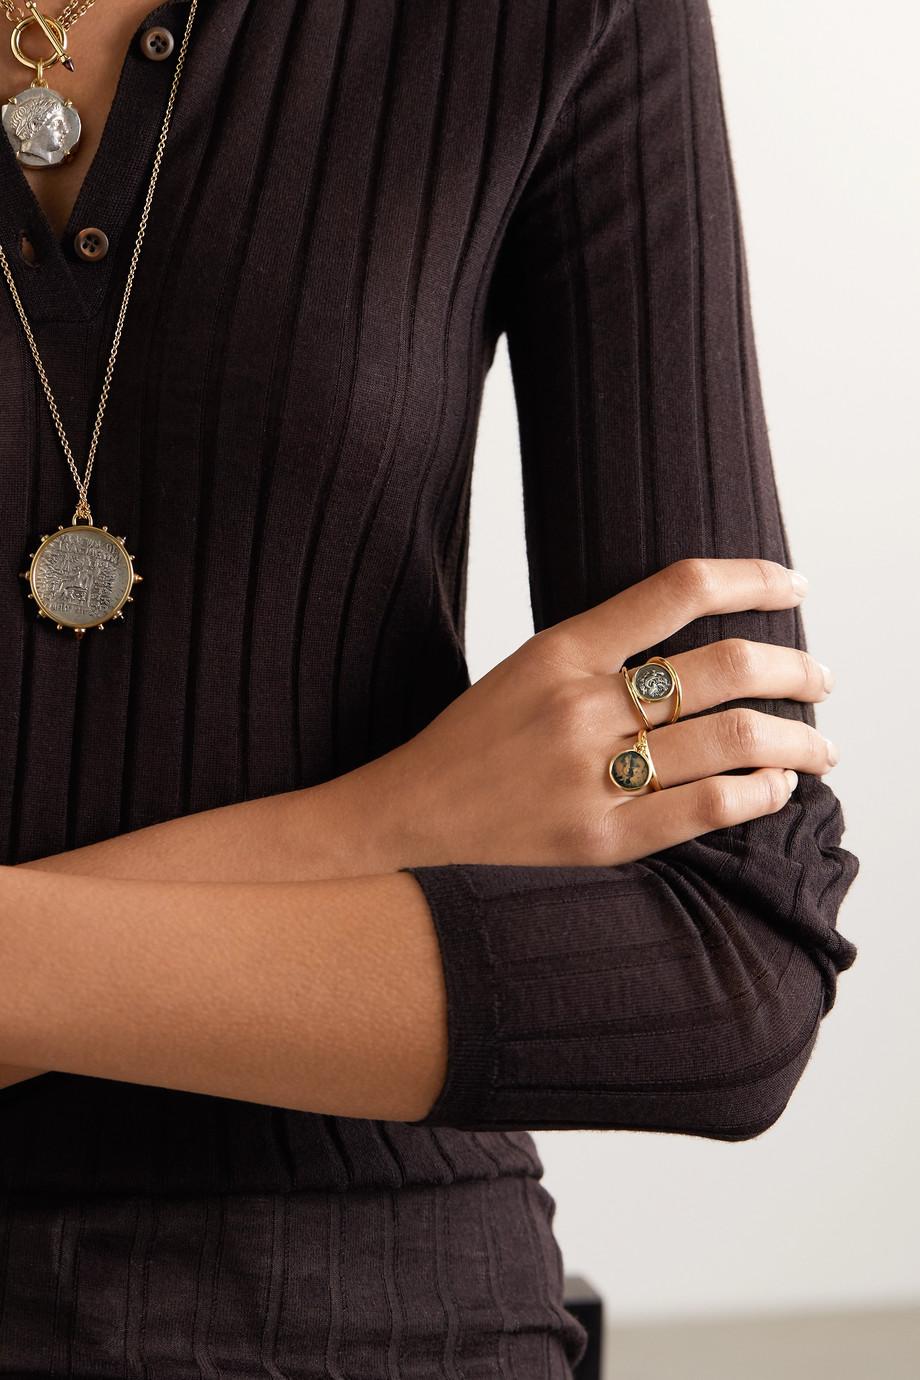 Dubini Emperor Flip 18-karat gold bronze ring